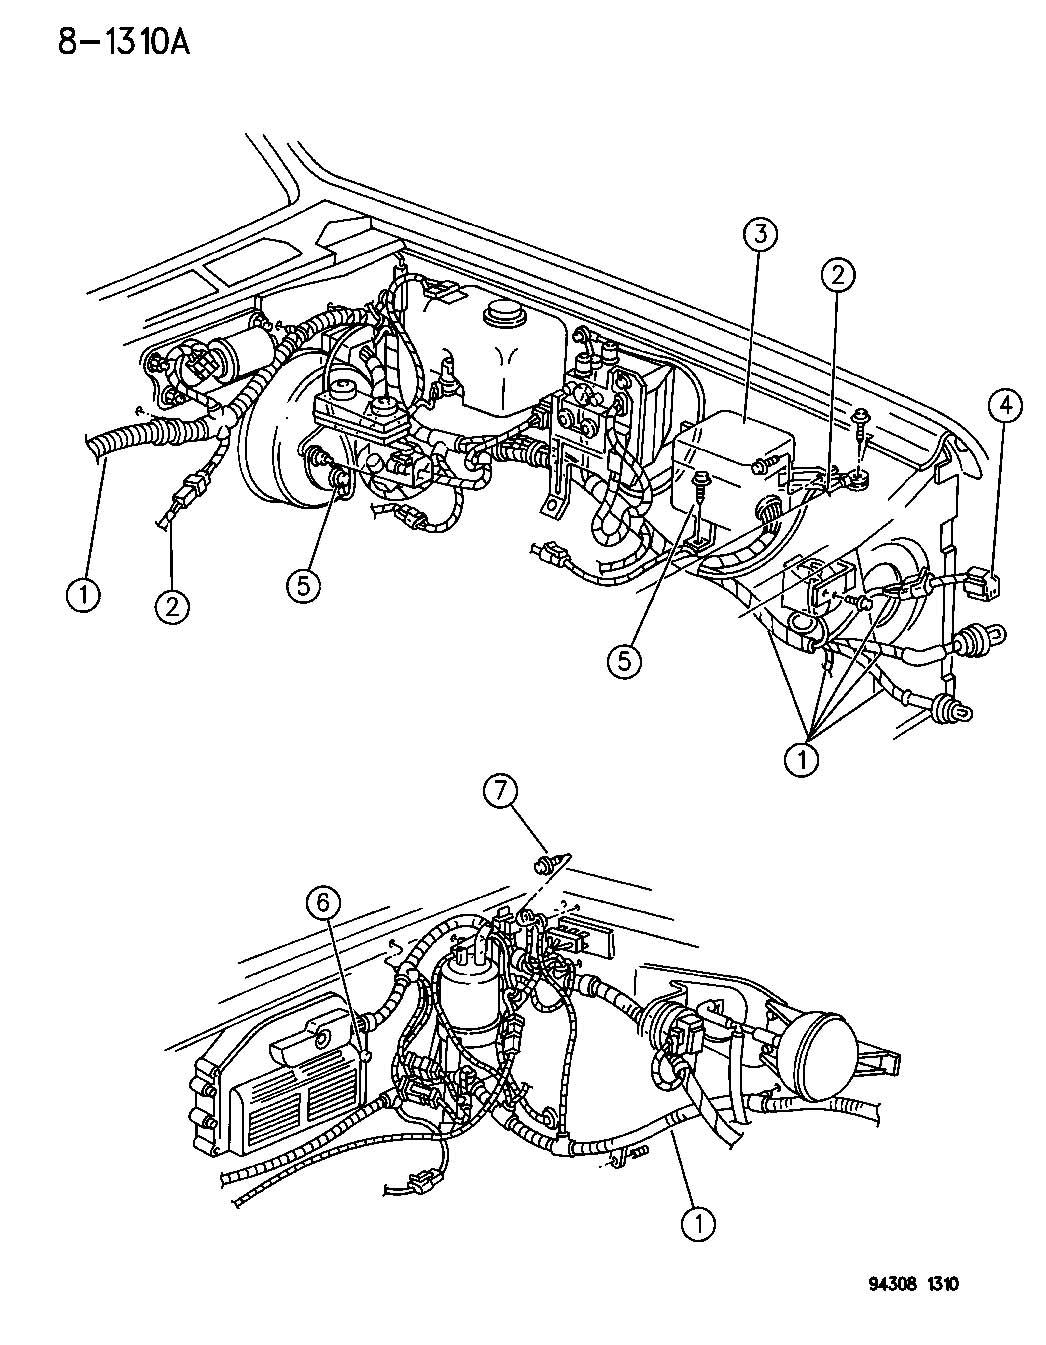 Dodge Dakota Magnum 5 2l Smpi V8 4 Spd Automatic 46rh Wiring Headlamp To Dash N Body